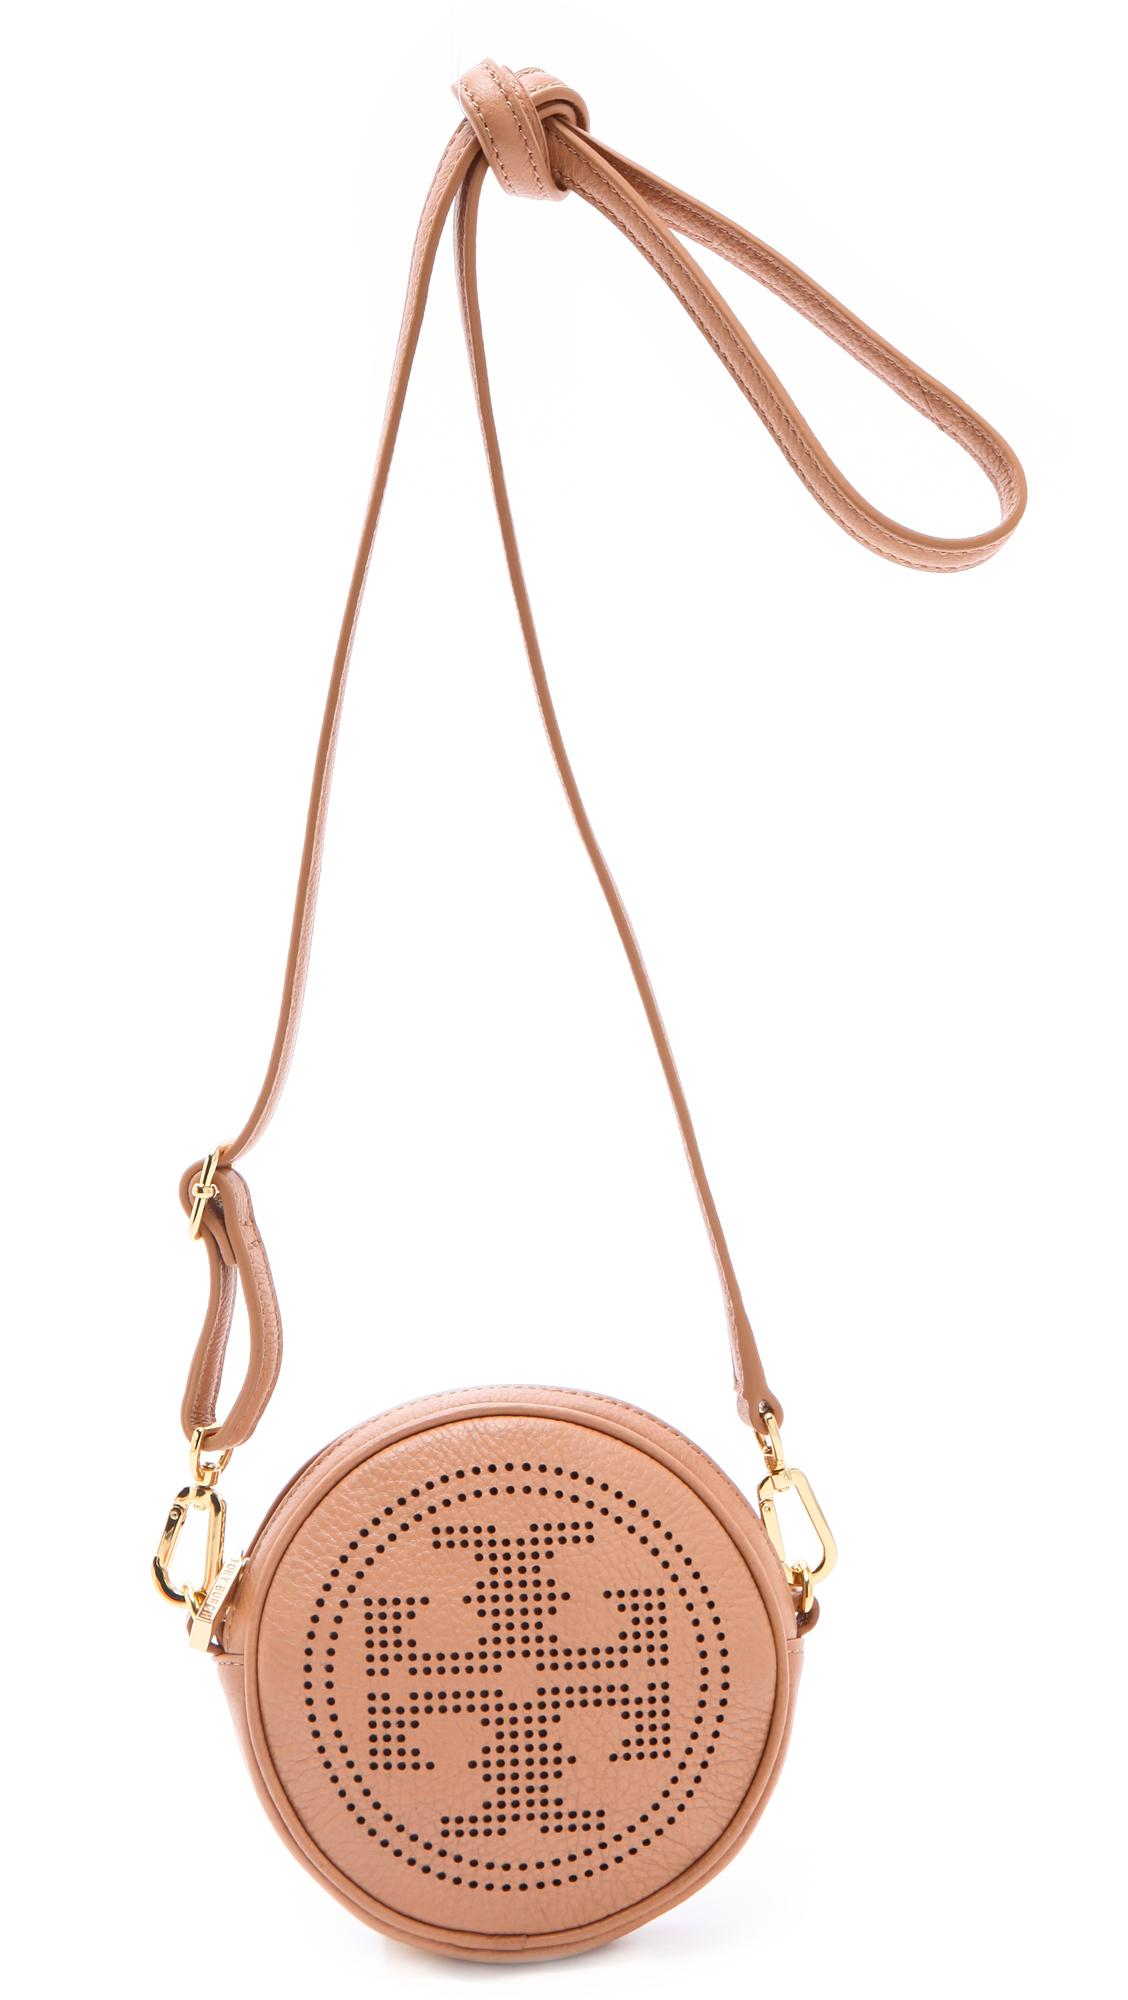 25cf90174ba Lyst - Tory Burch Perforated Logo Cross Body Bag in Pink